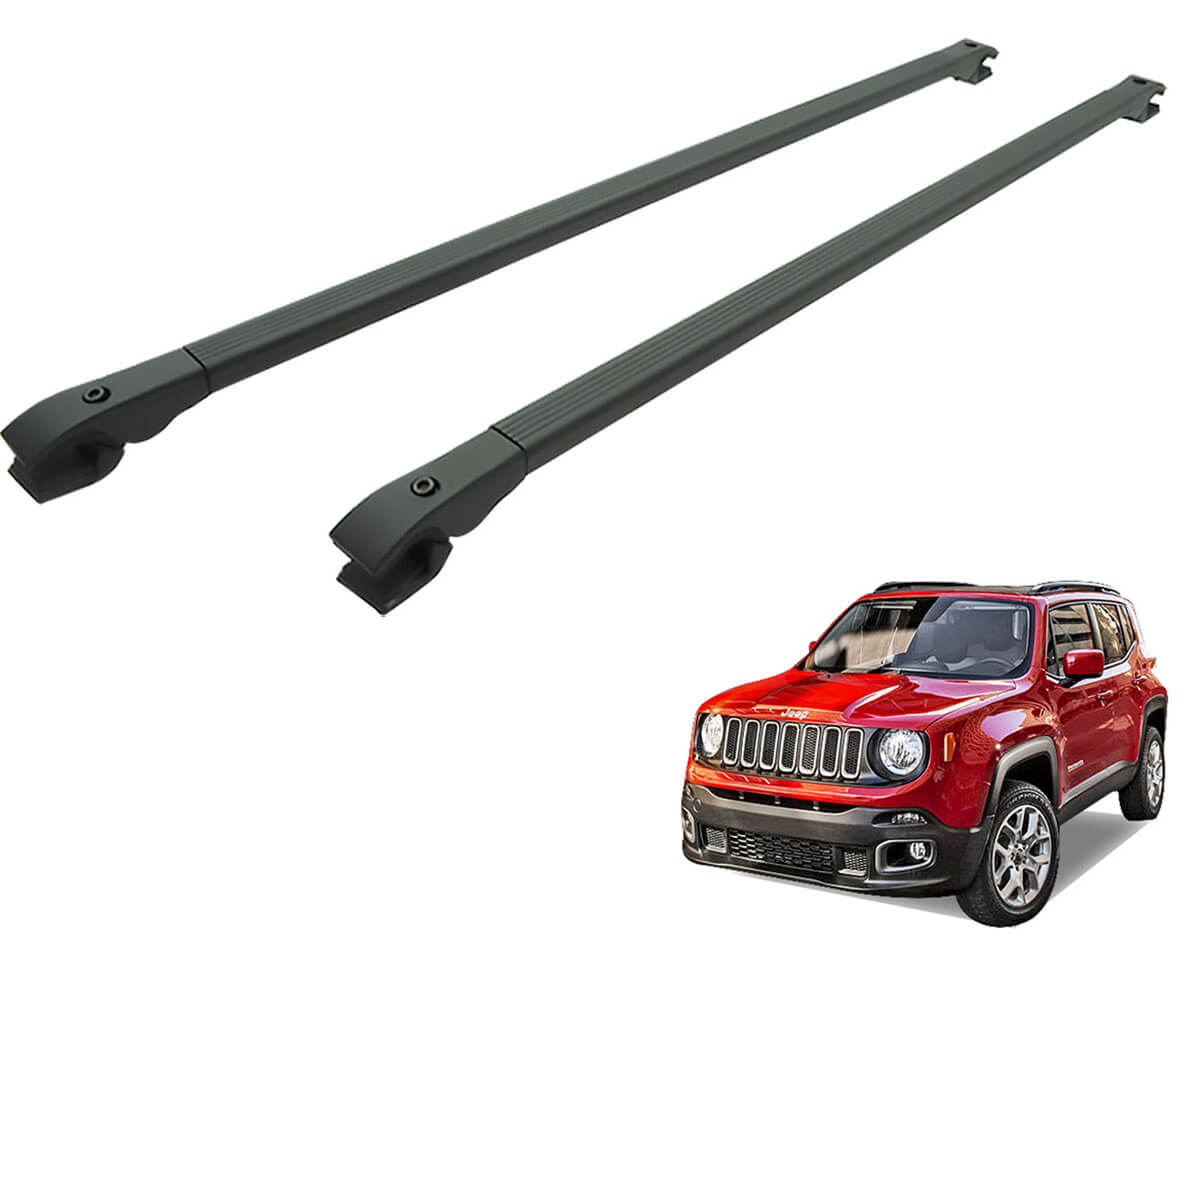 Travessa rack de teto alumínio preta Jeep Renegade 2016 a 2021